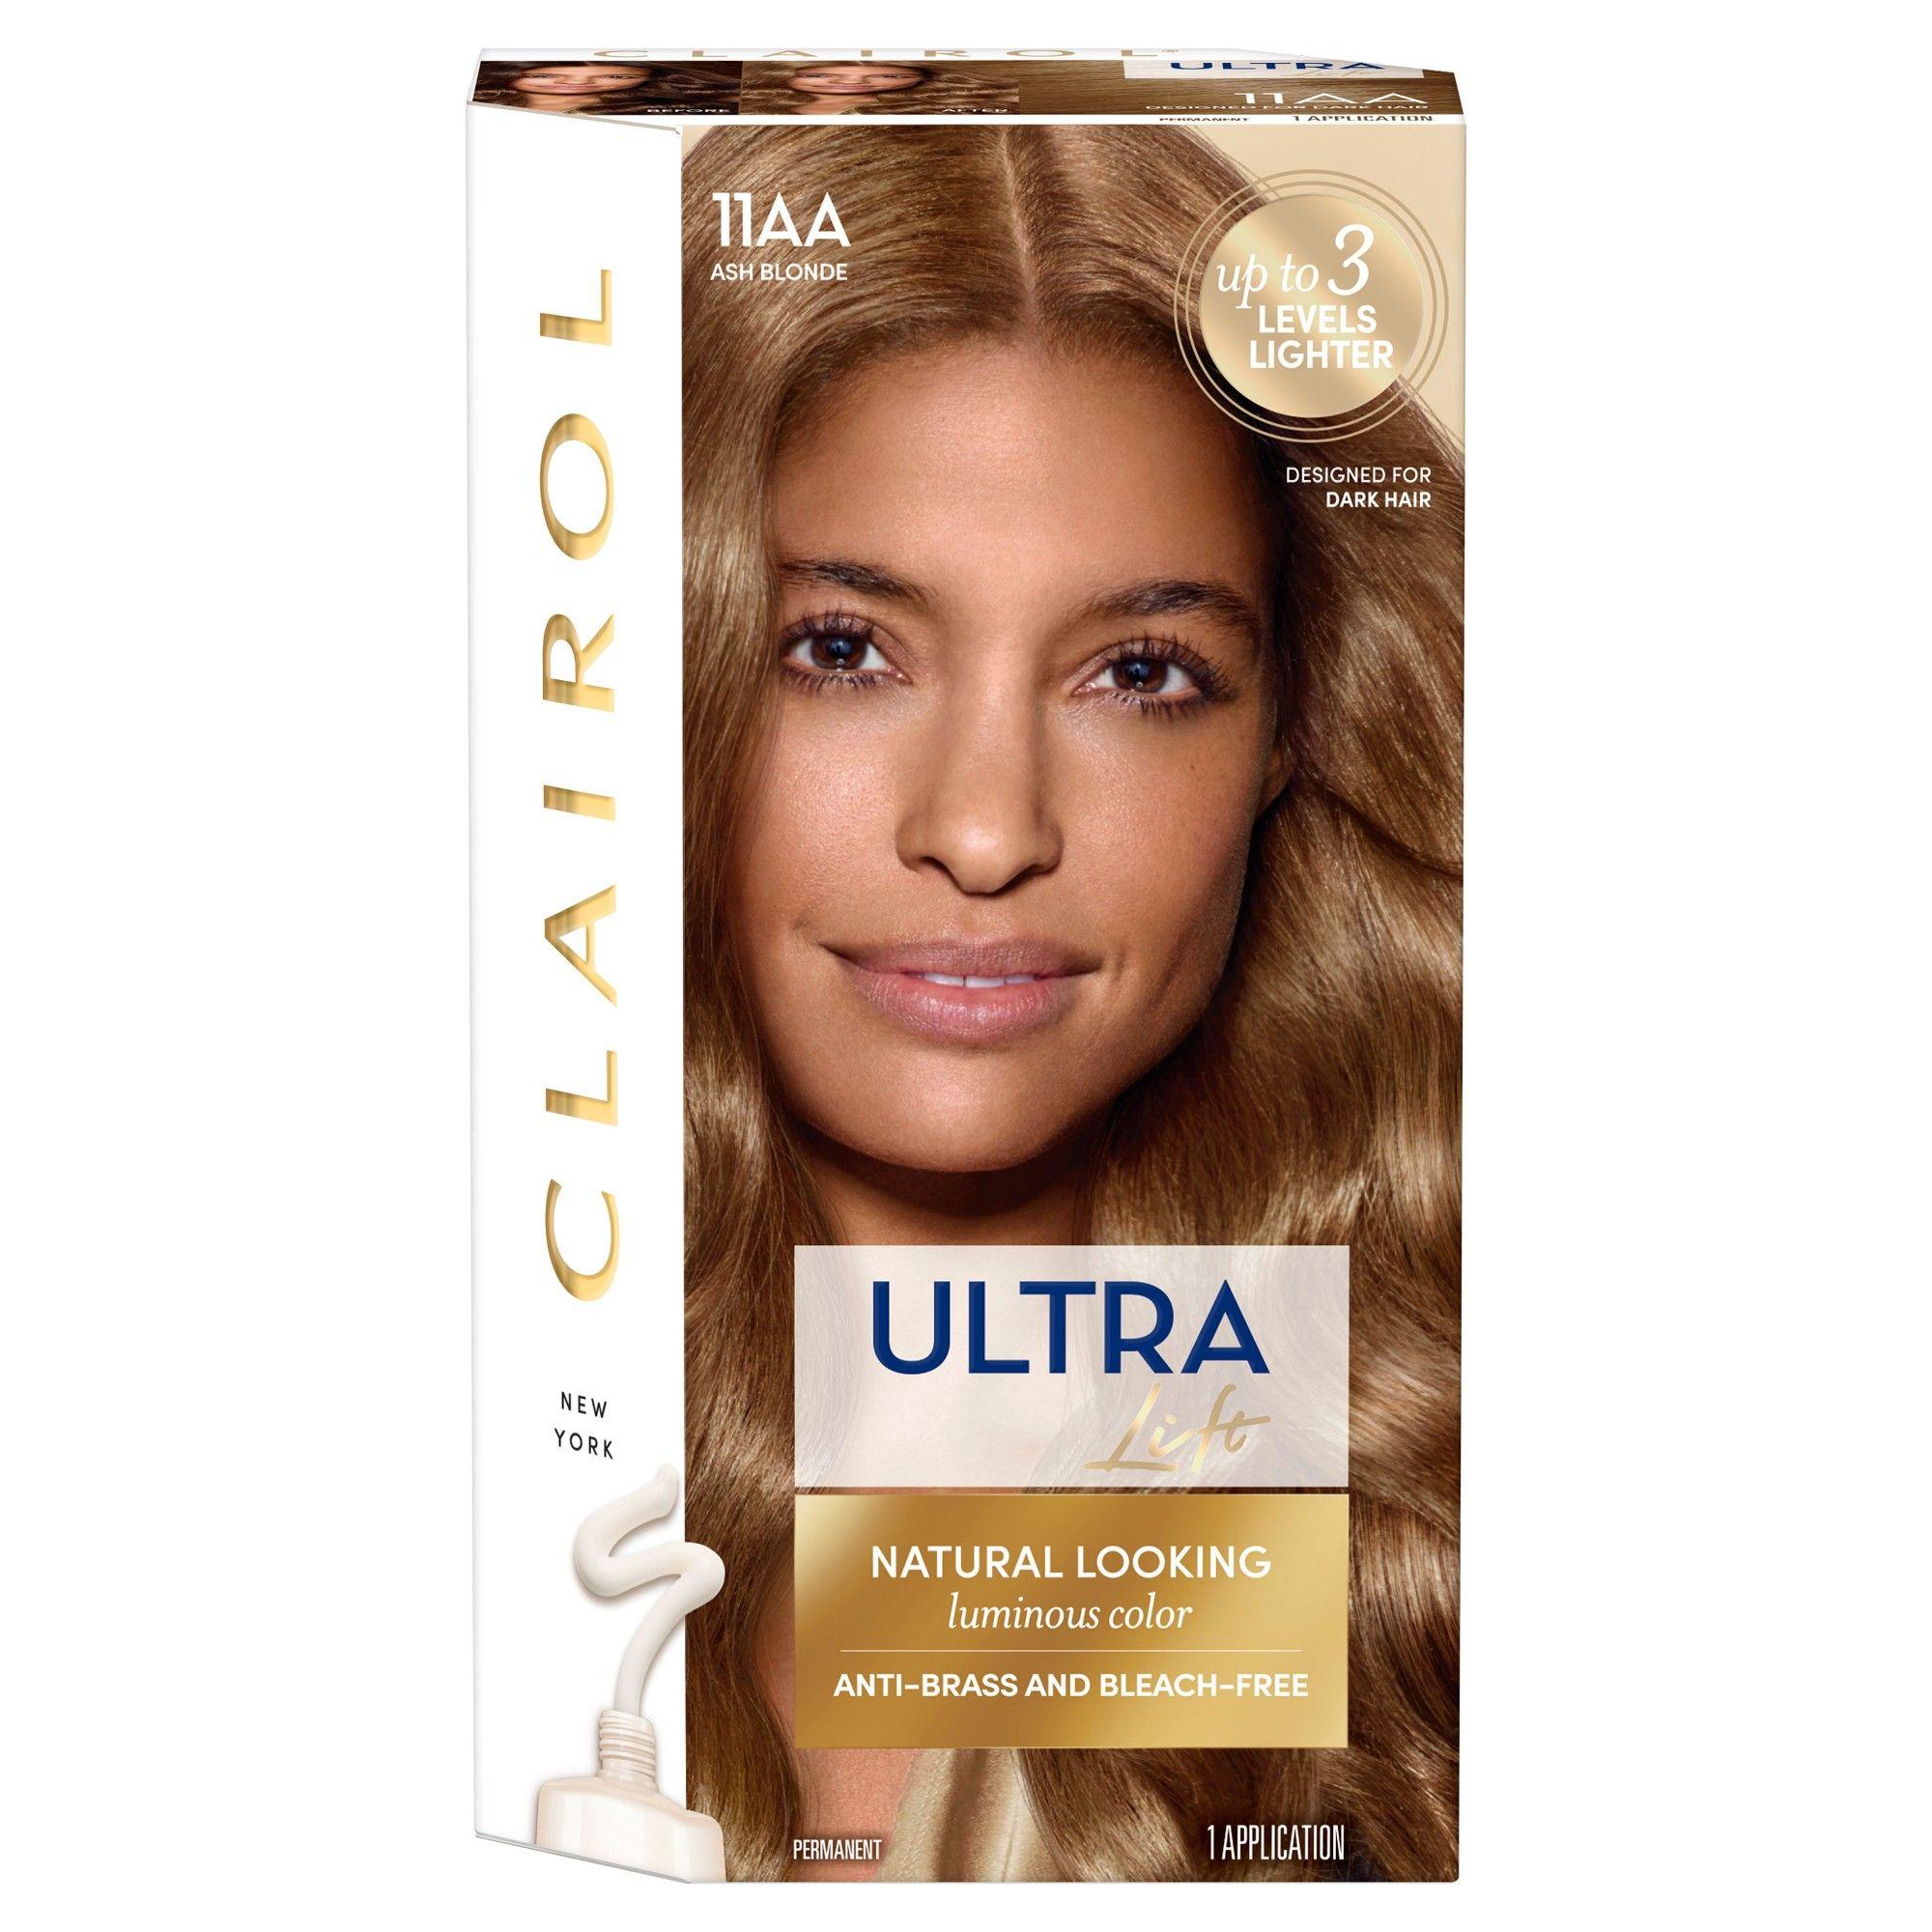 Clairol Nice N Easy Ultra Lift 11aa Ash Blonde 1 Kit Ash